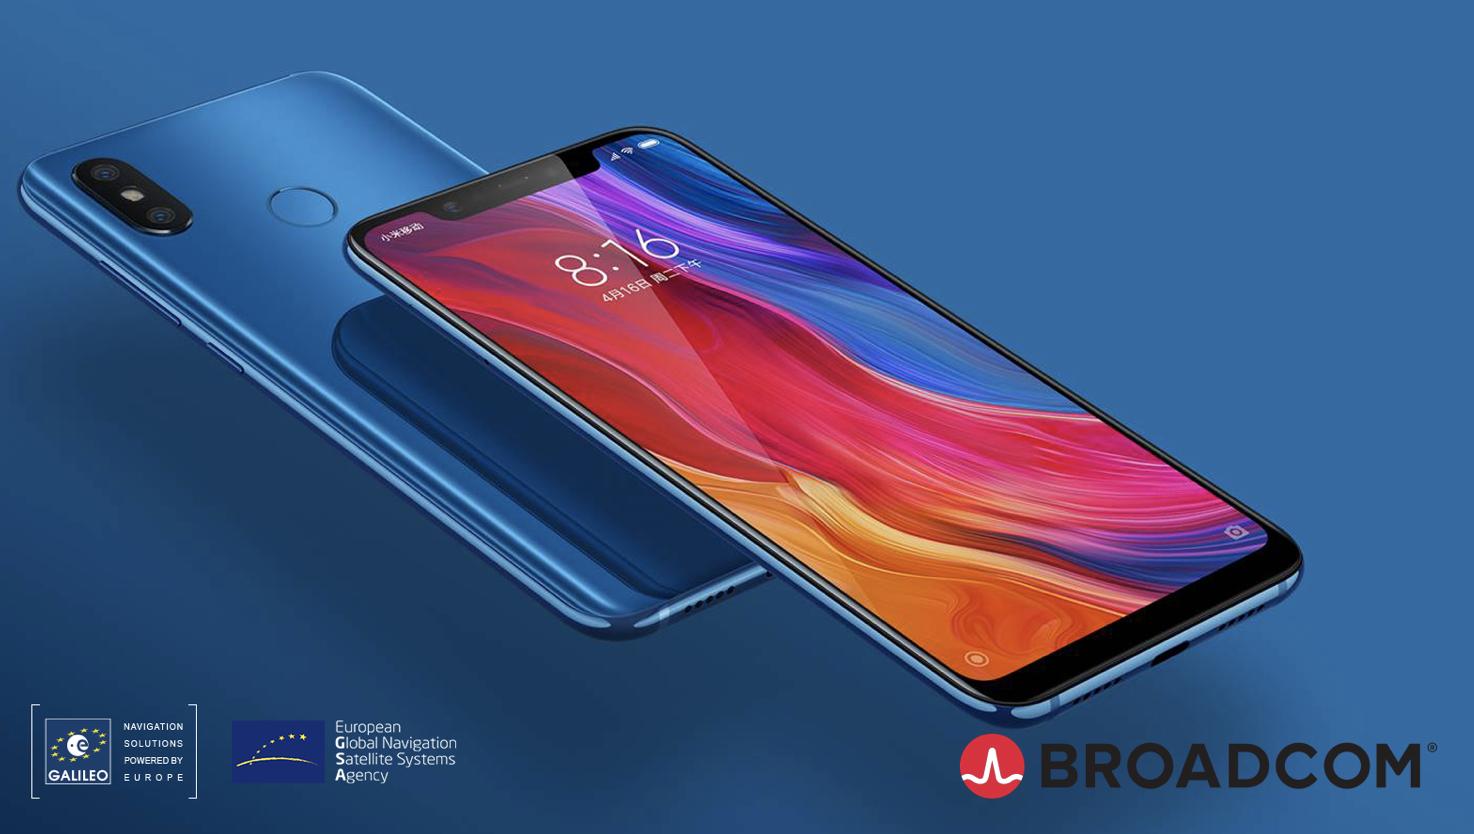 Broadcom dual frequency GNSS smartphone